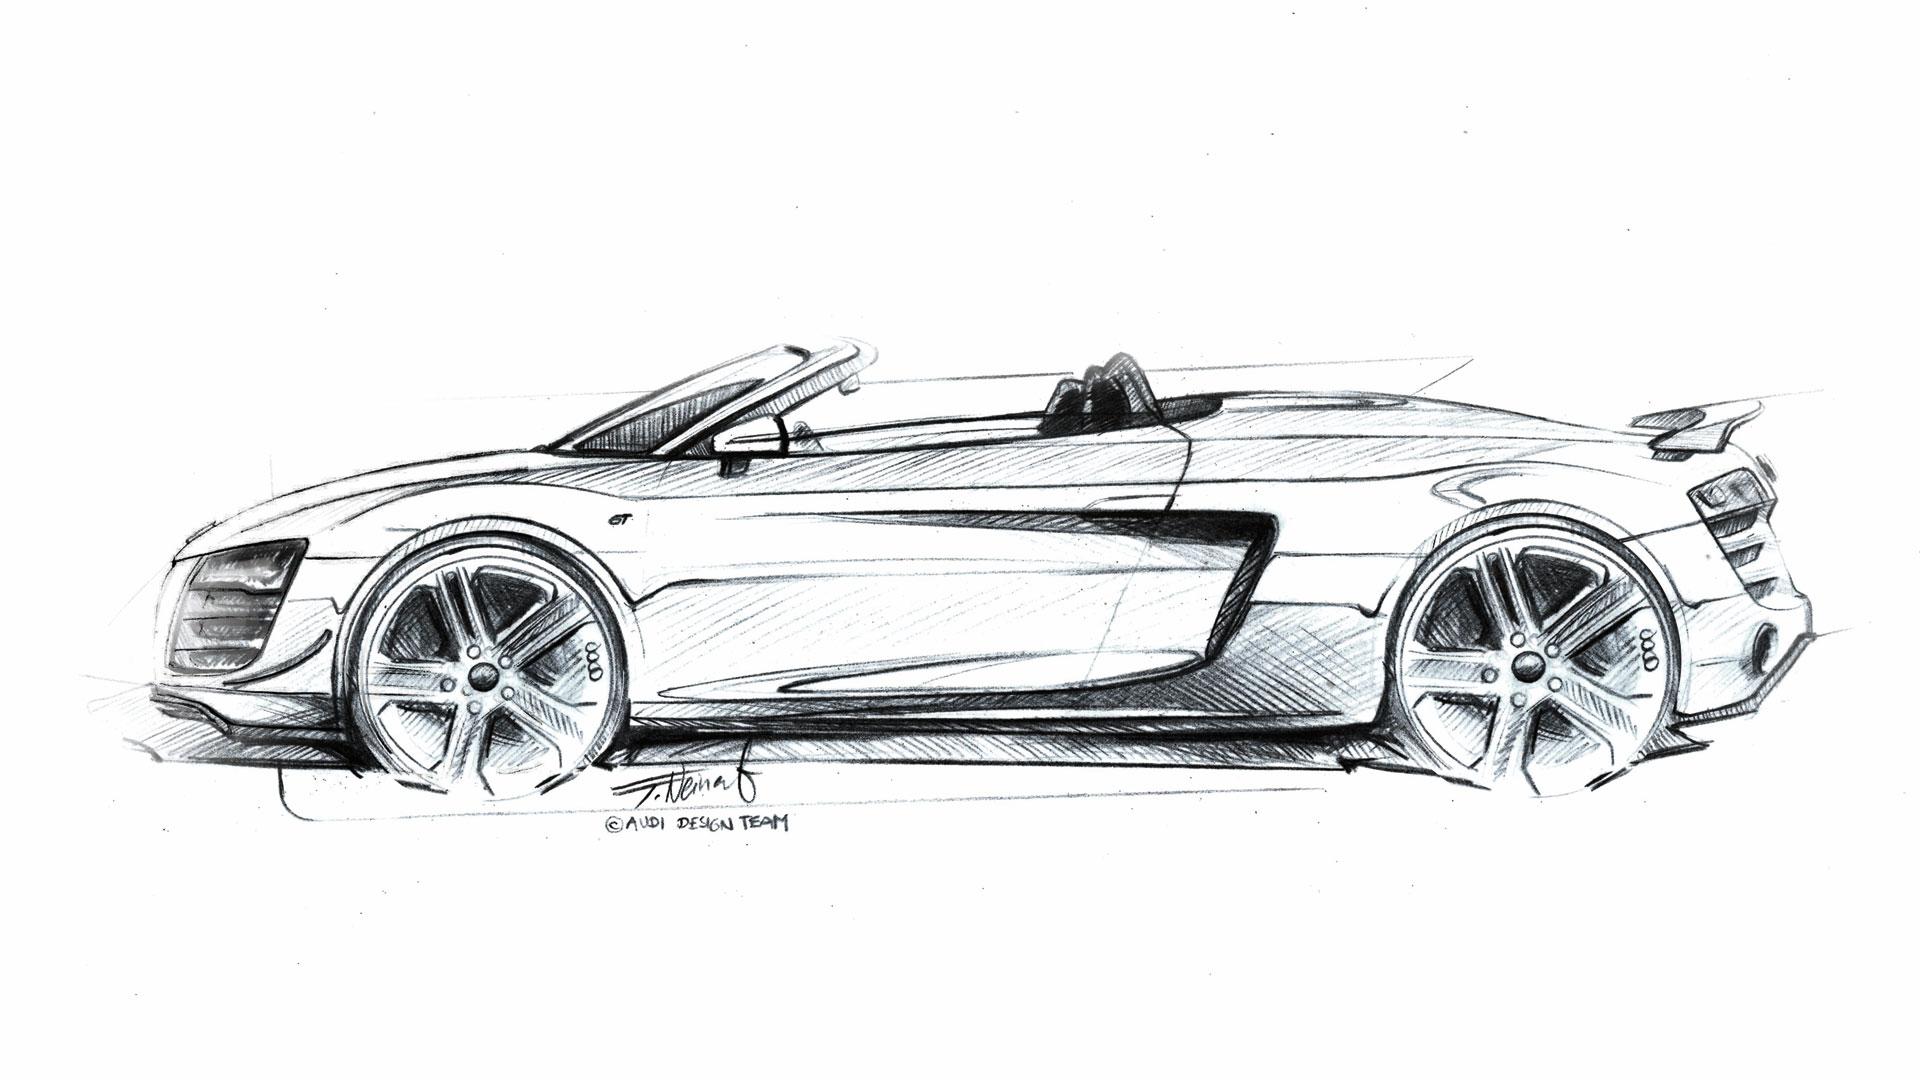 Audi R8 Gt Spyder Design Sketch Sketch Coloring Page